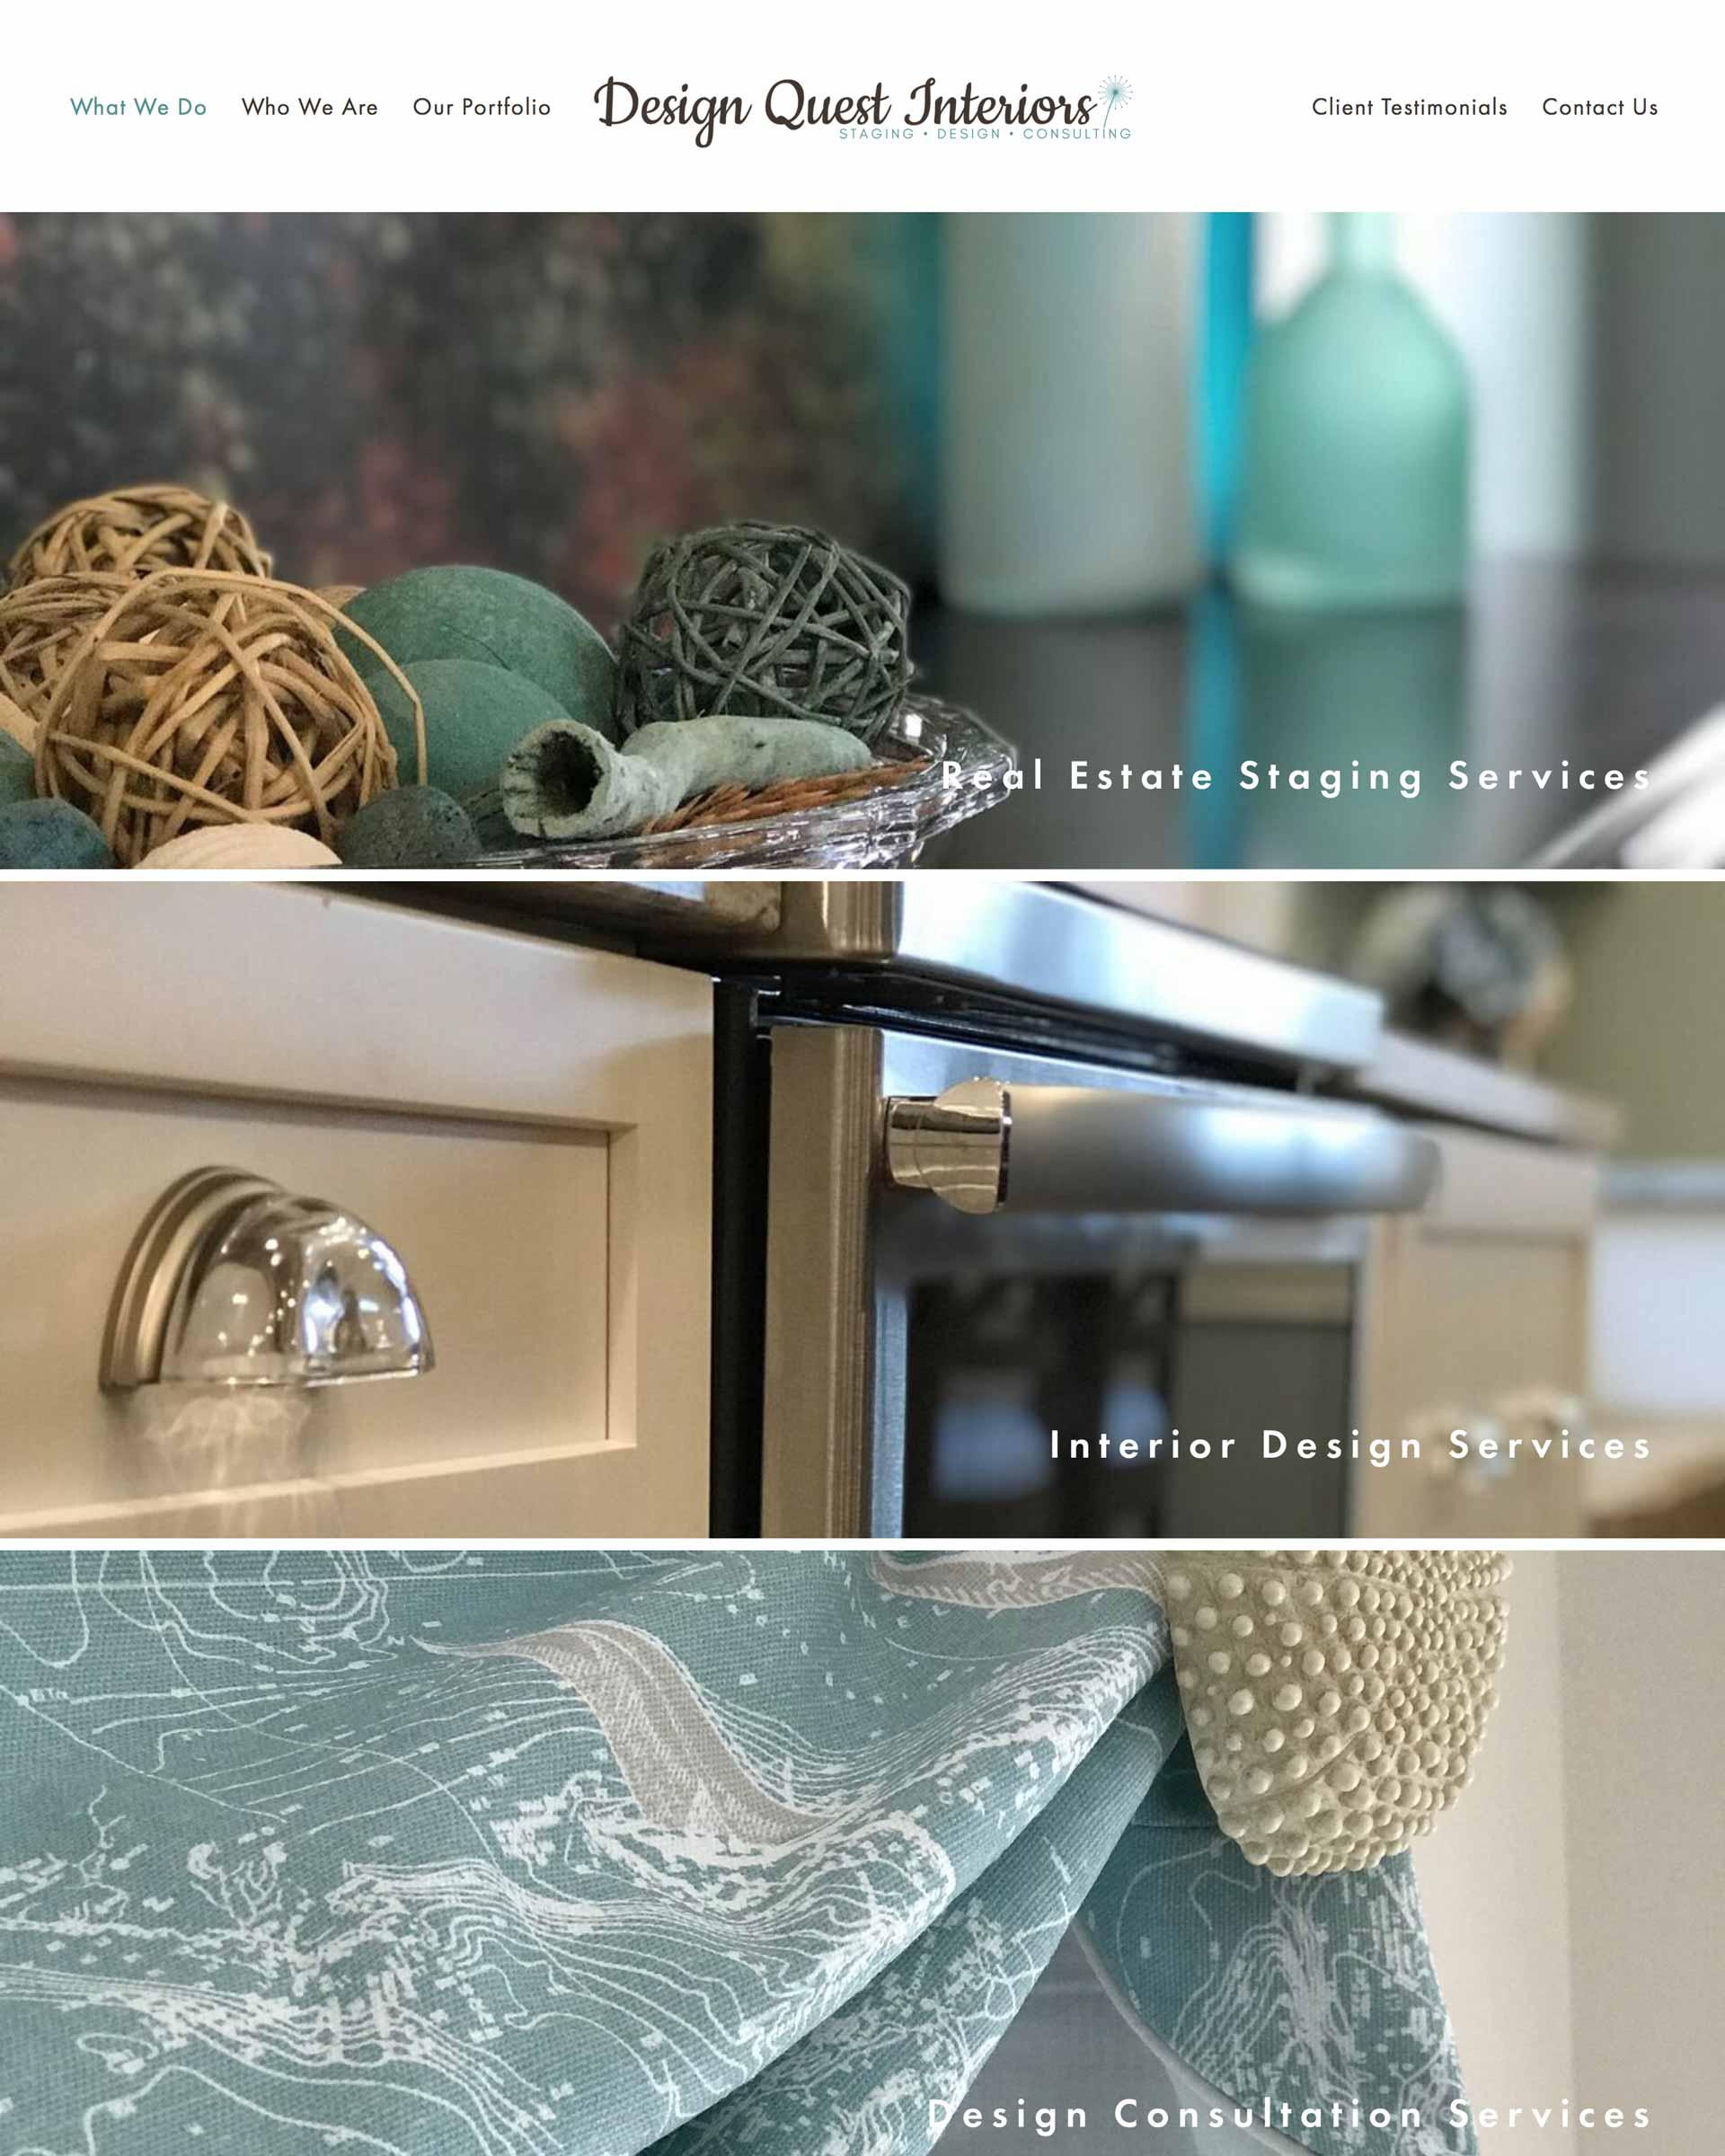 Design Quest Interiors - A Home Staging, Interior Design and Design Consultation Firm